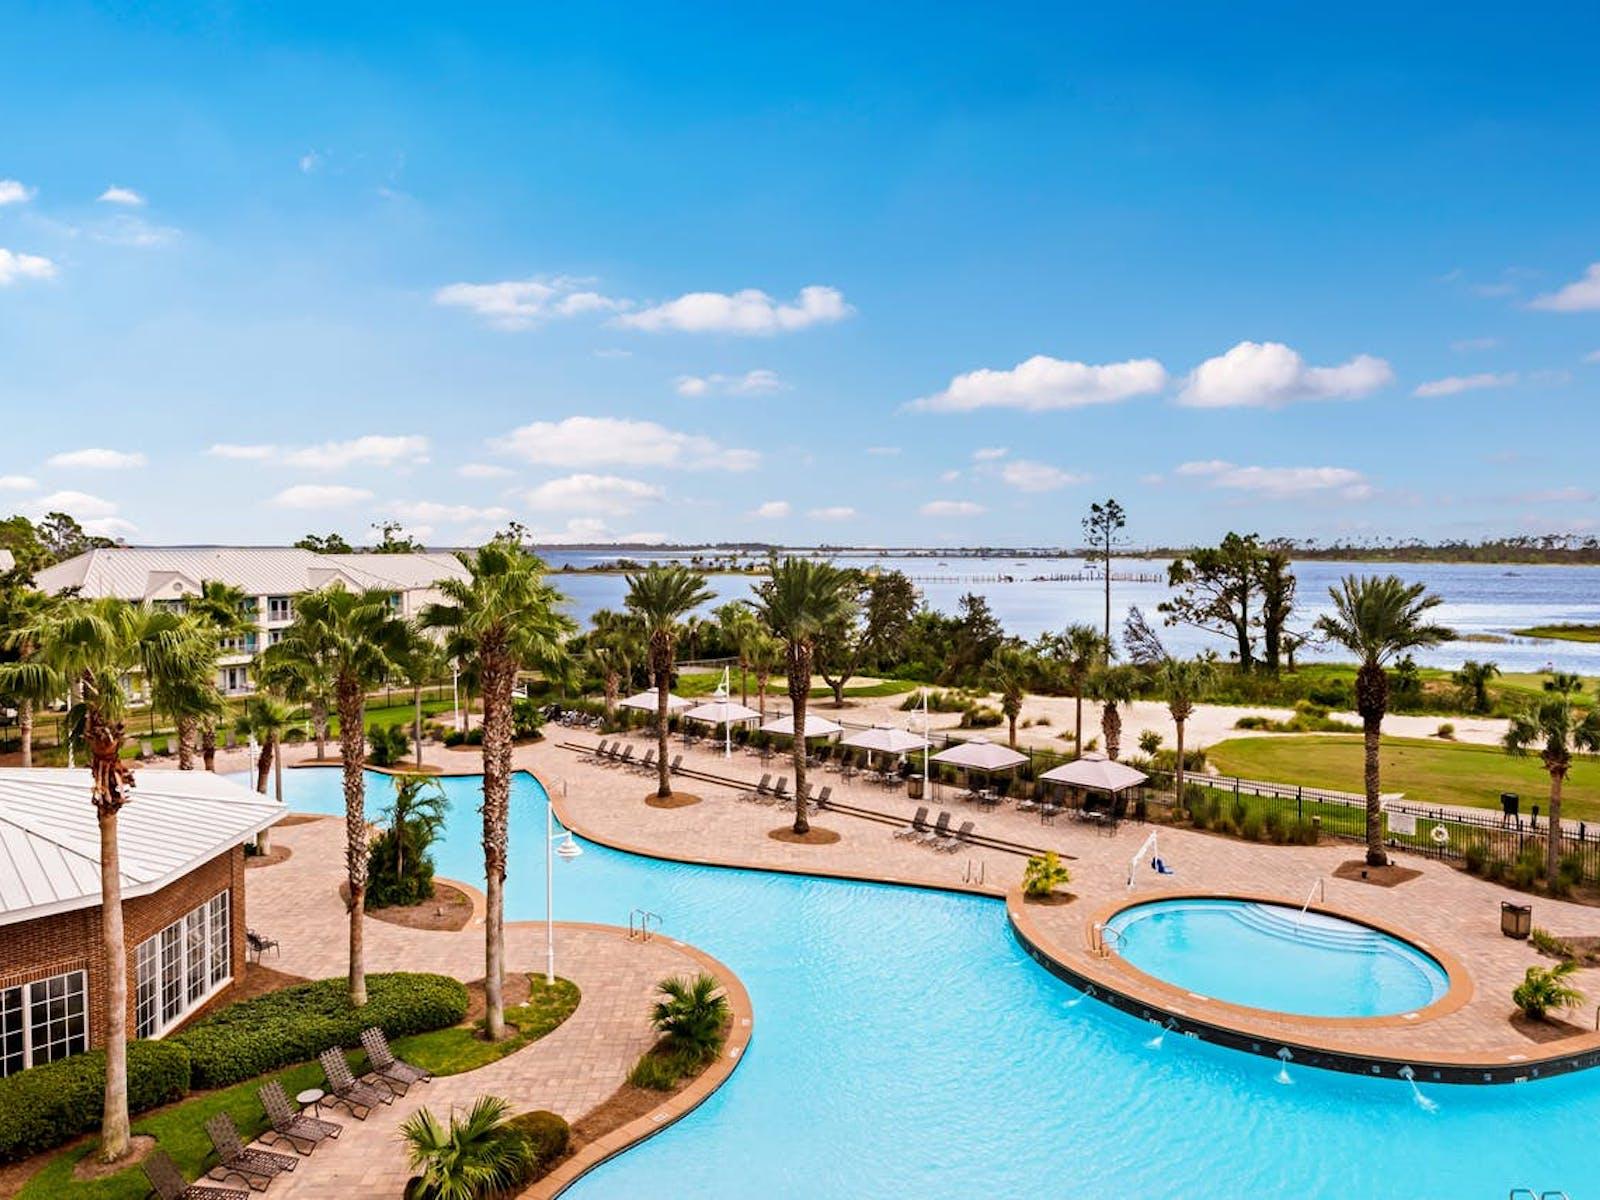 resort pool and hot tub in Florida